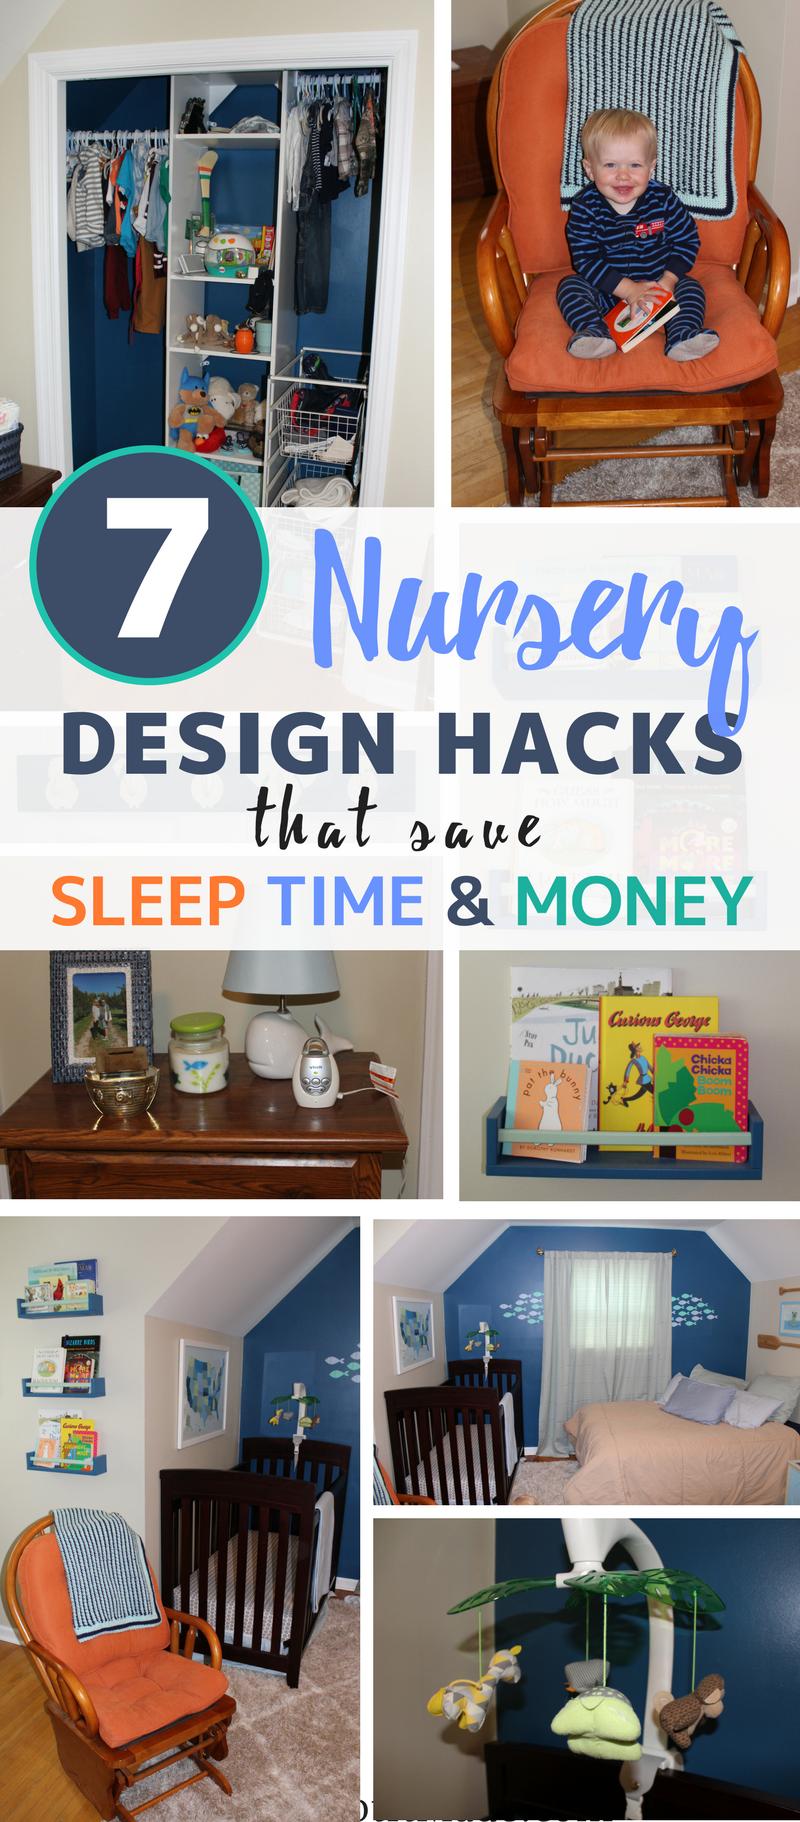 7 Nursery Design Hacks that Save Sleep, Time and Money | Mom's Got it Made  | Nursery design, Baby sleep problems, Design hack